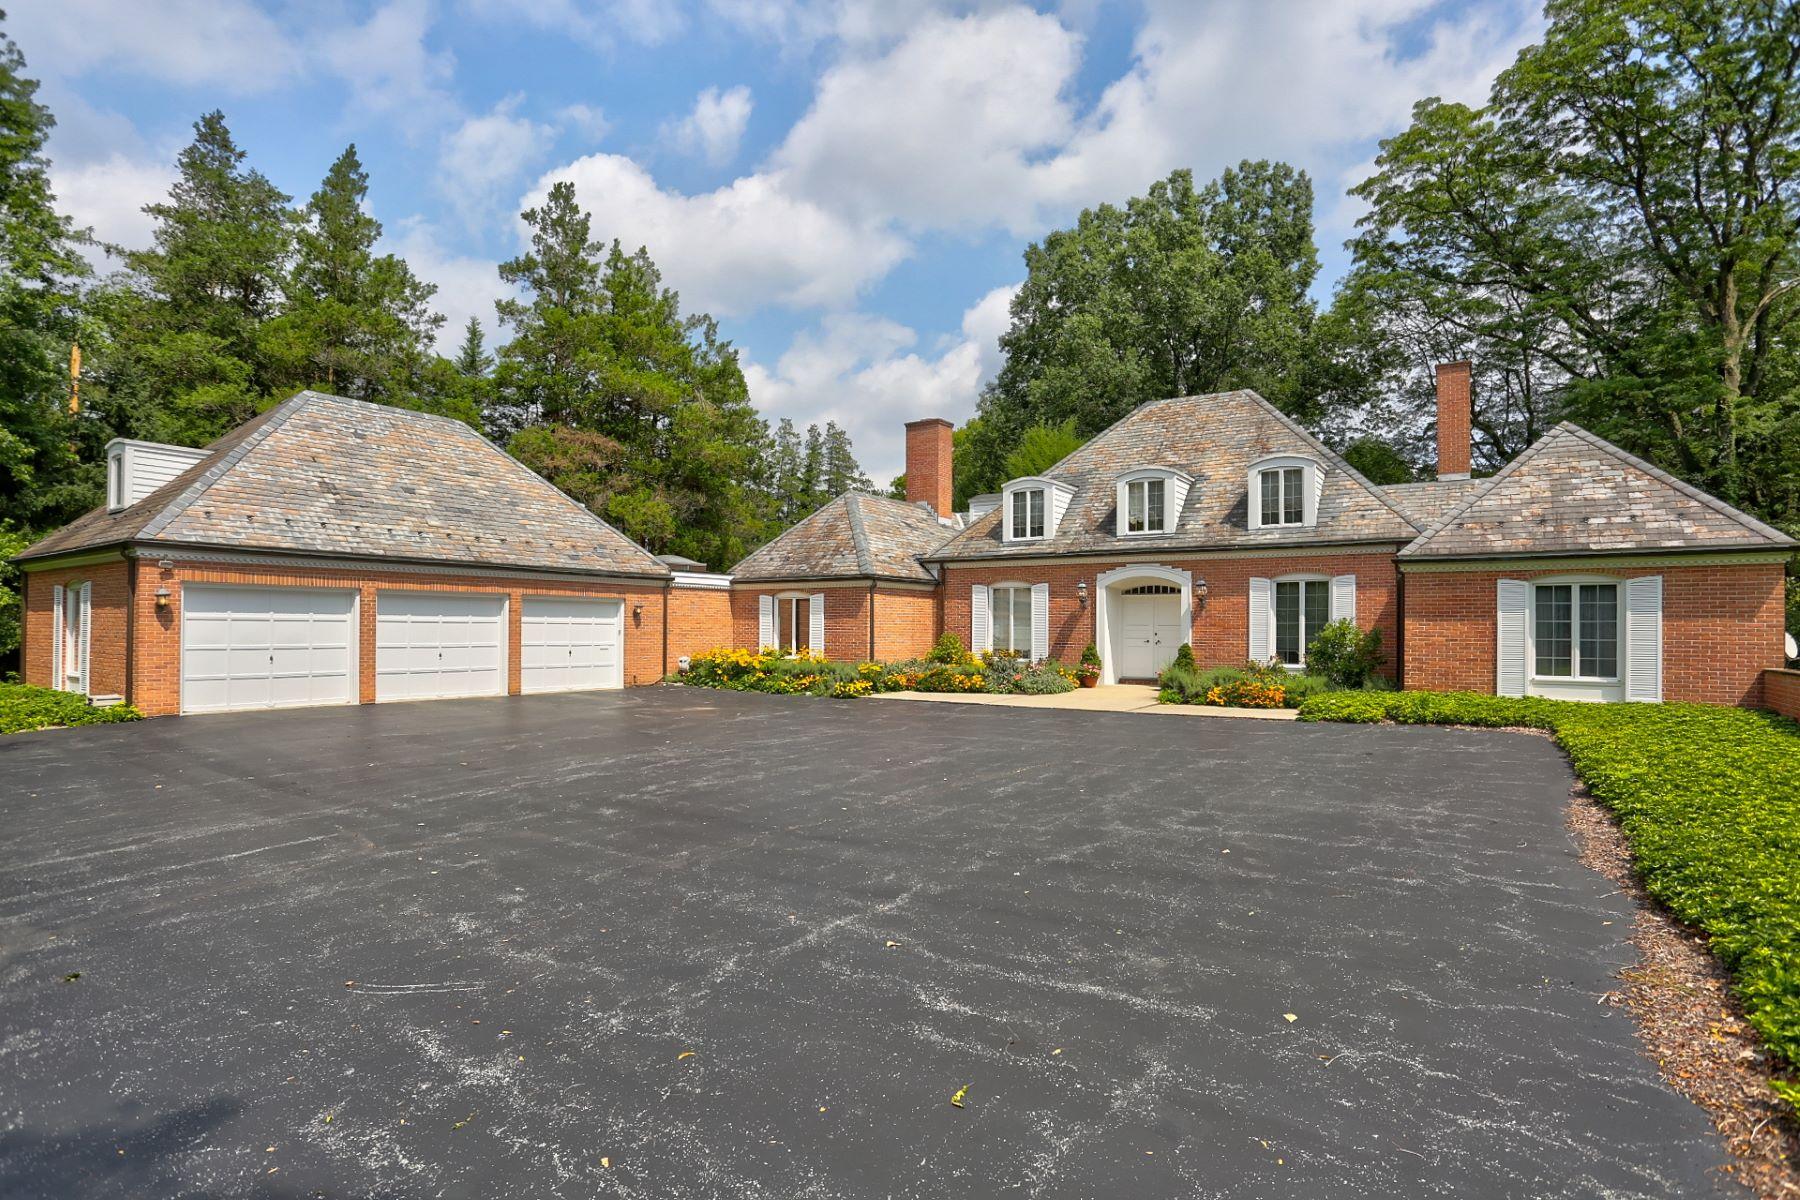 独户住宅 为 销售 在 605 Hamilton Road 605 Hamilton Road 兰开斯特, 宾夕法尼亚州 17603 美国